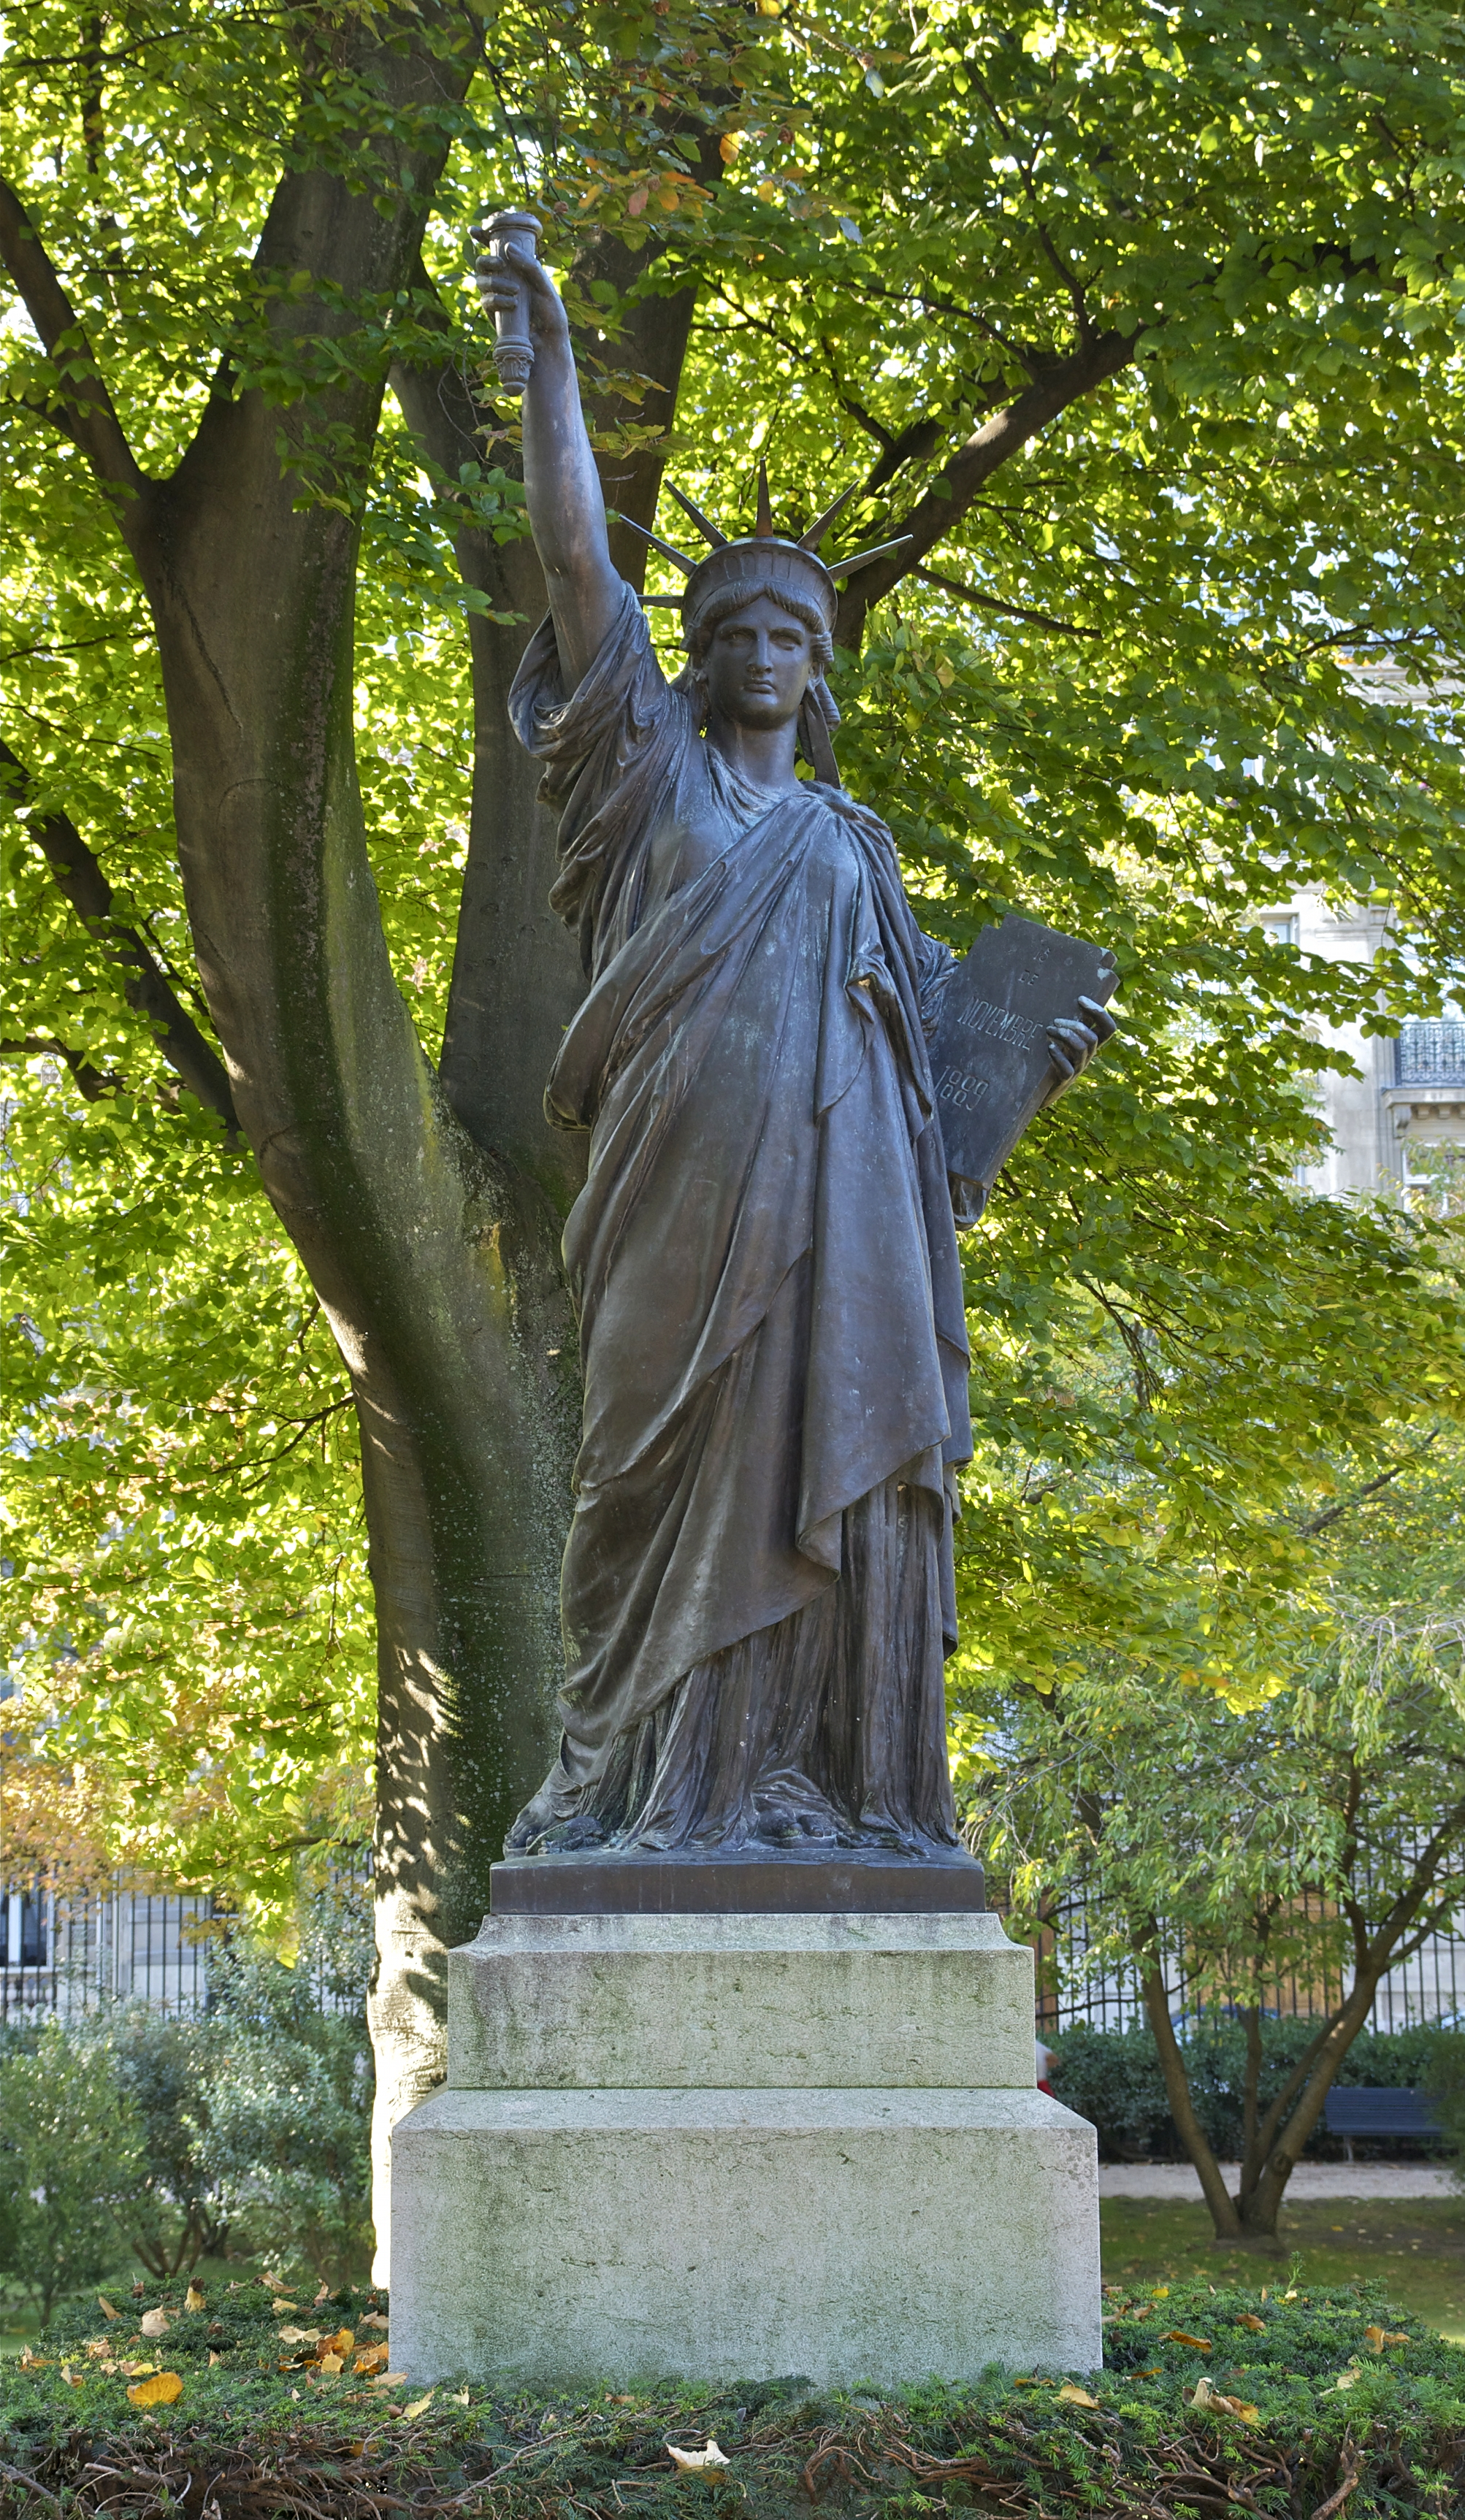 File la libert clairant le monde jardin du luxembourg - Jardin du luxembourg statue de la liberte ...